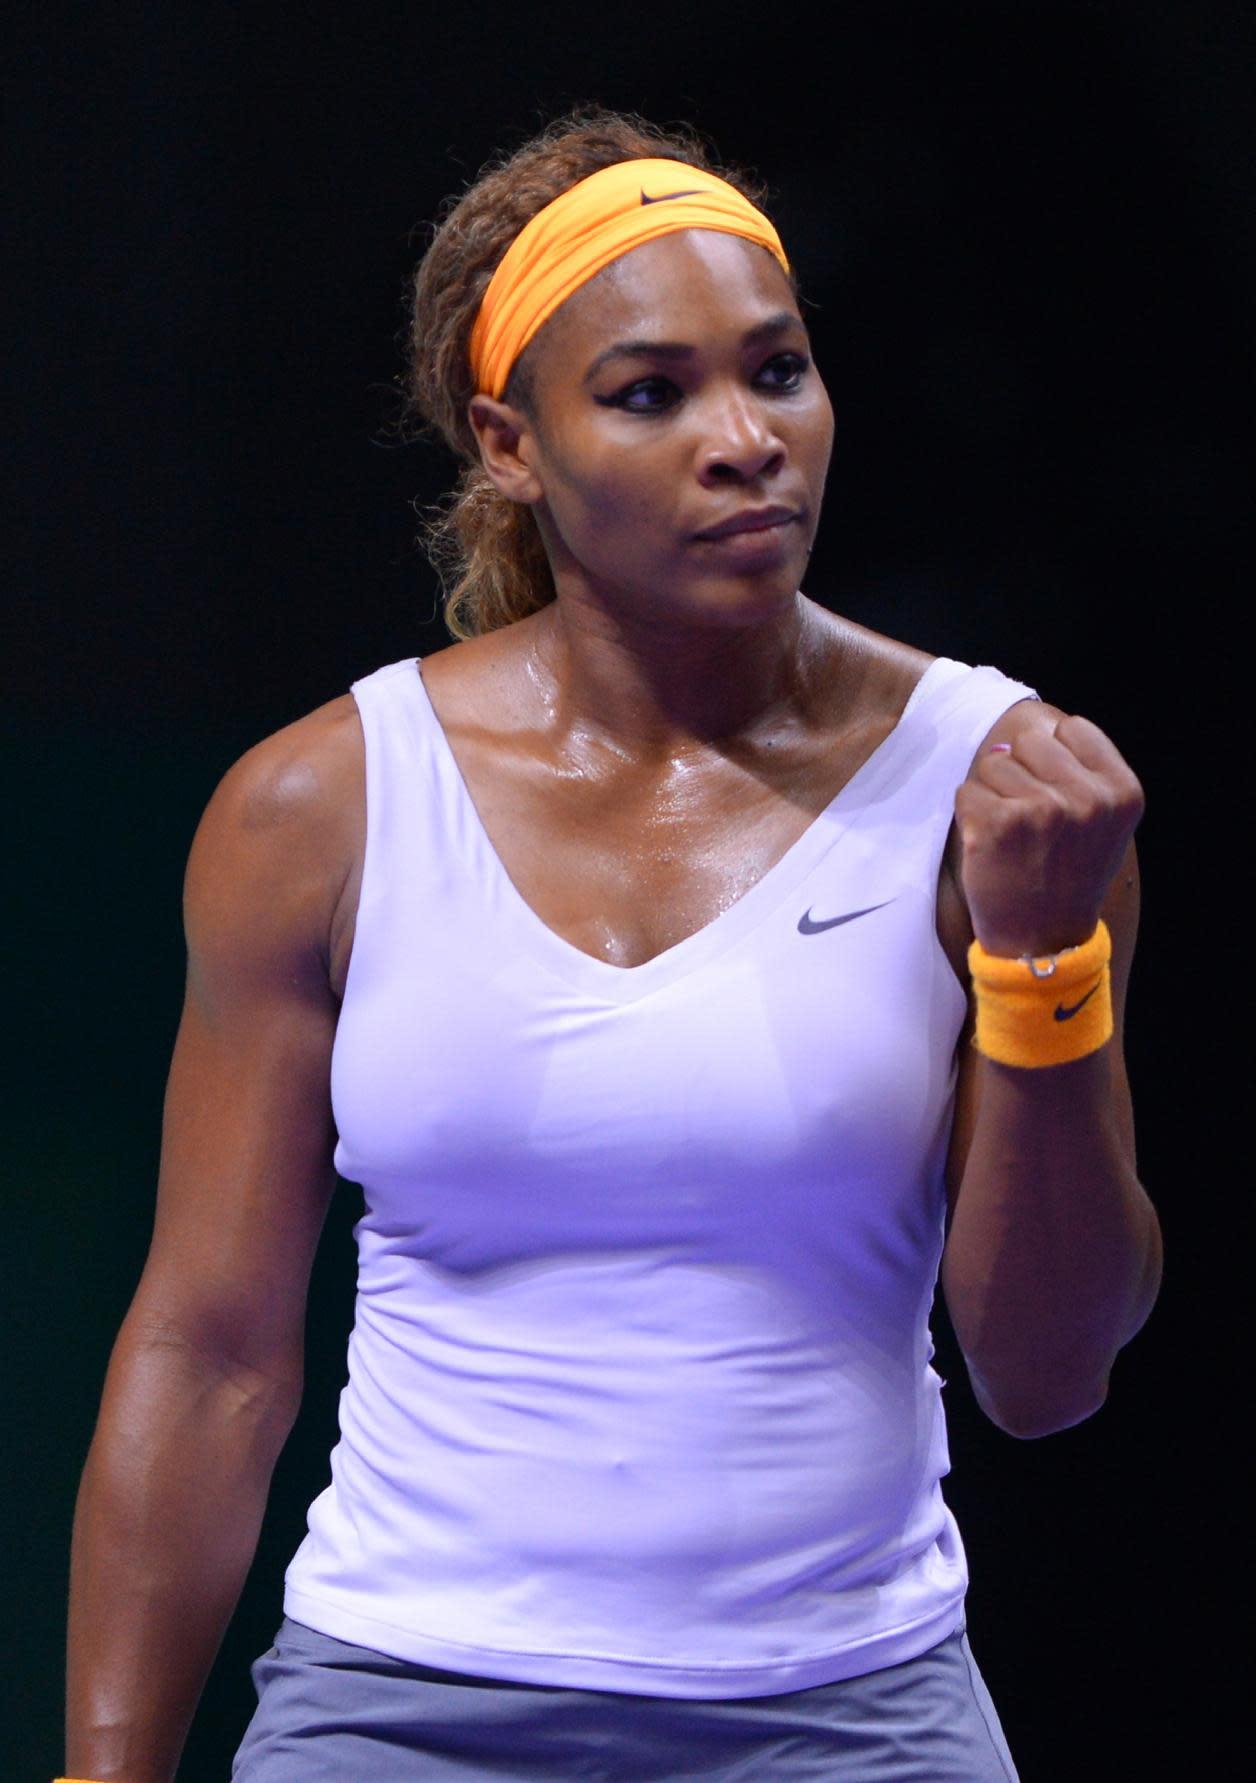 Sony Open: Serena Williams beats Li Na to win 7th title